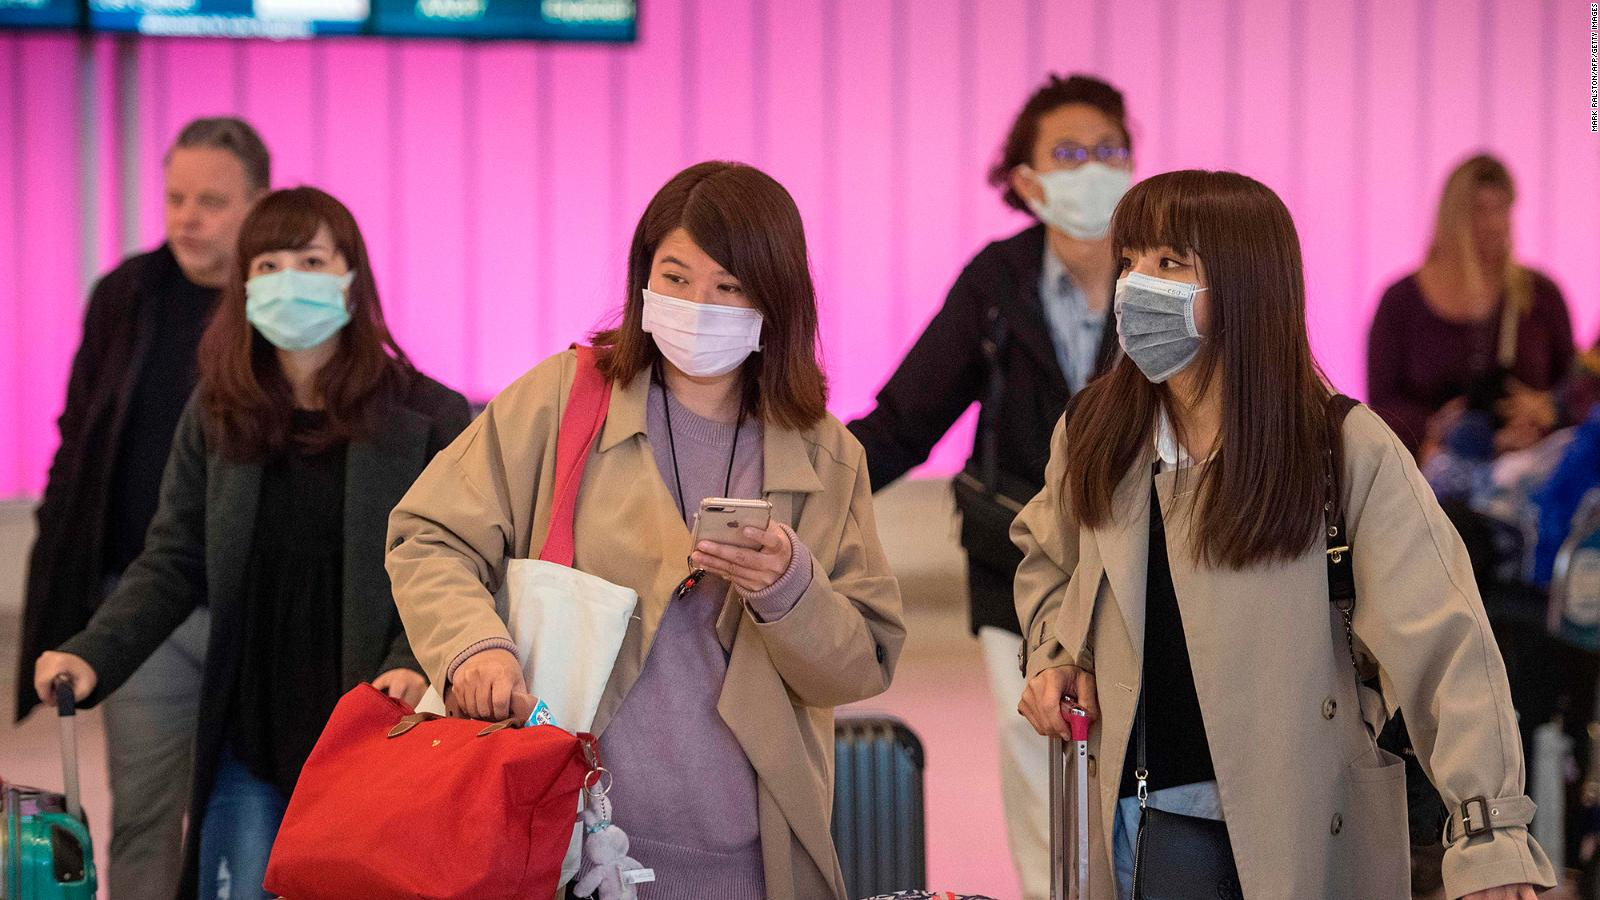 New Study An Eye Opener On How Coronavirus Is Spreading And How